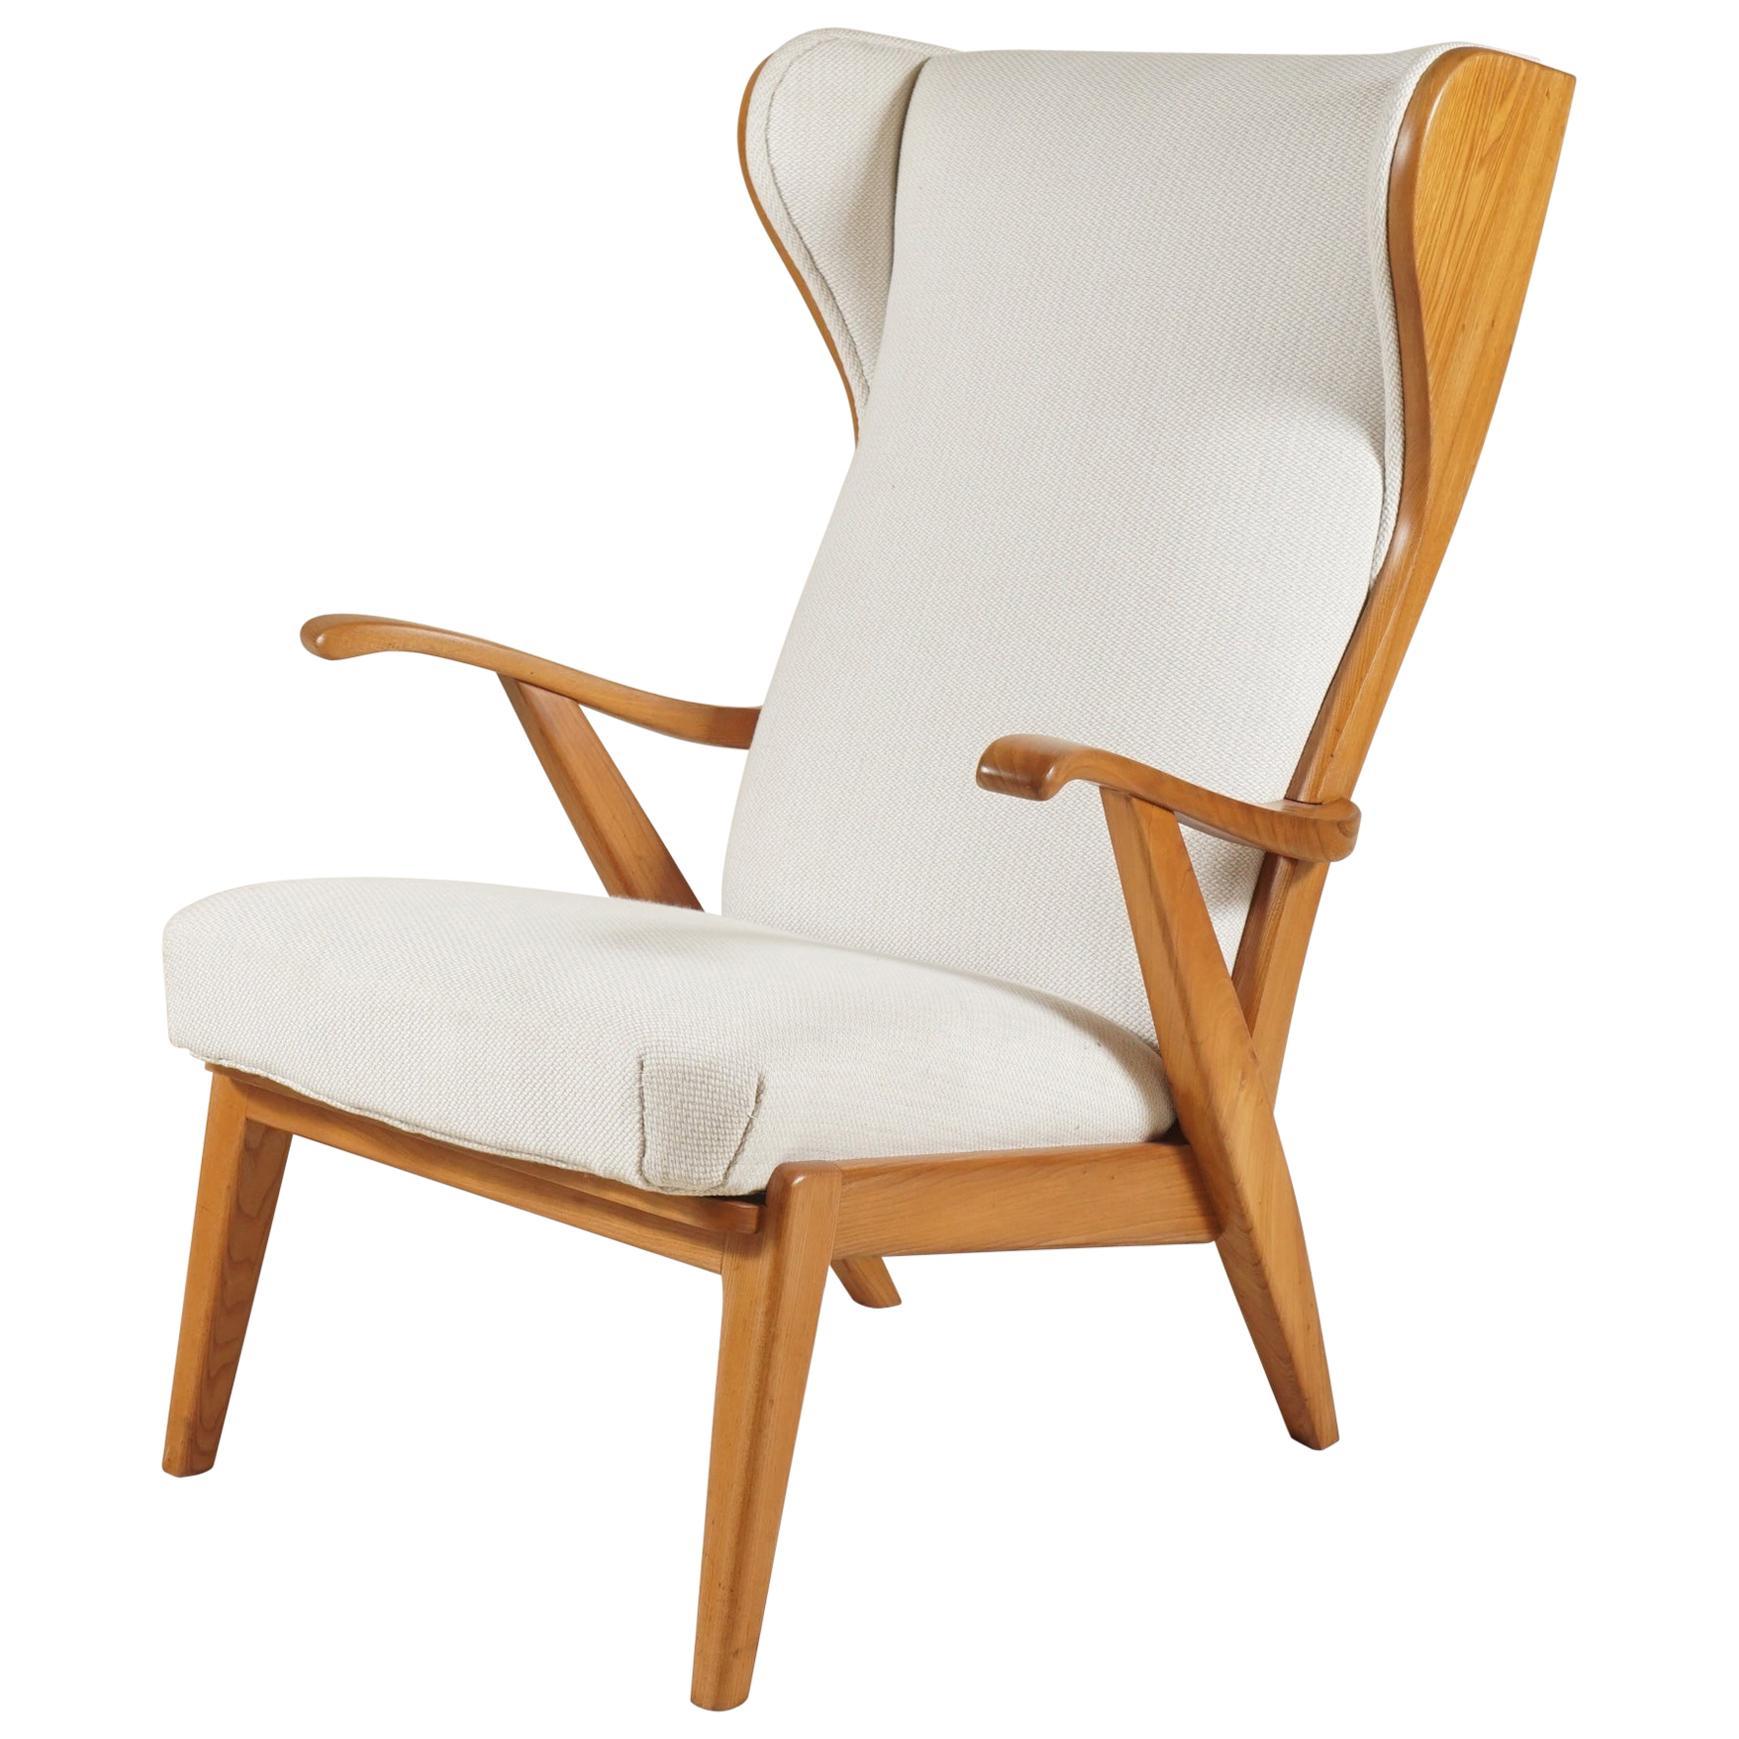 Danish Wingback Chair by Søren Willadsen